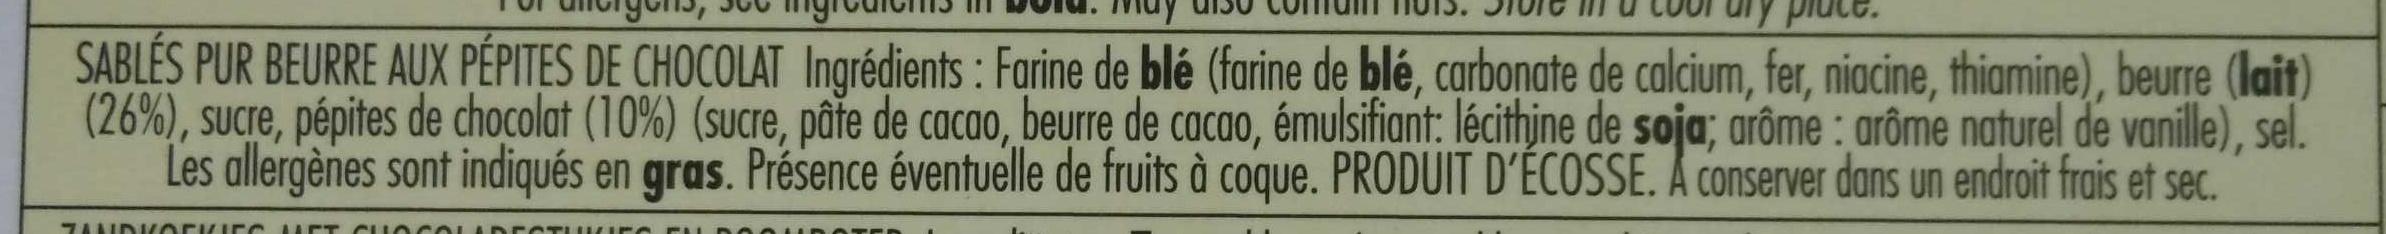 Pure butter shortbread - Ingredients